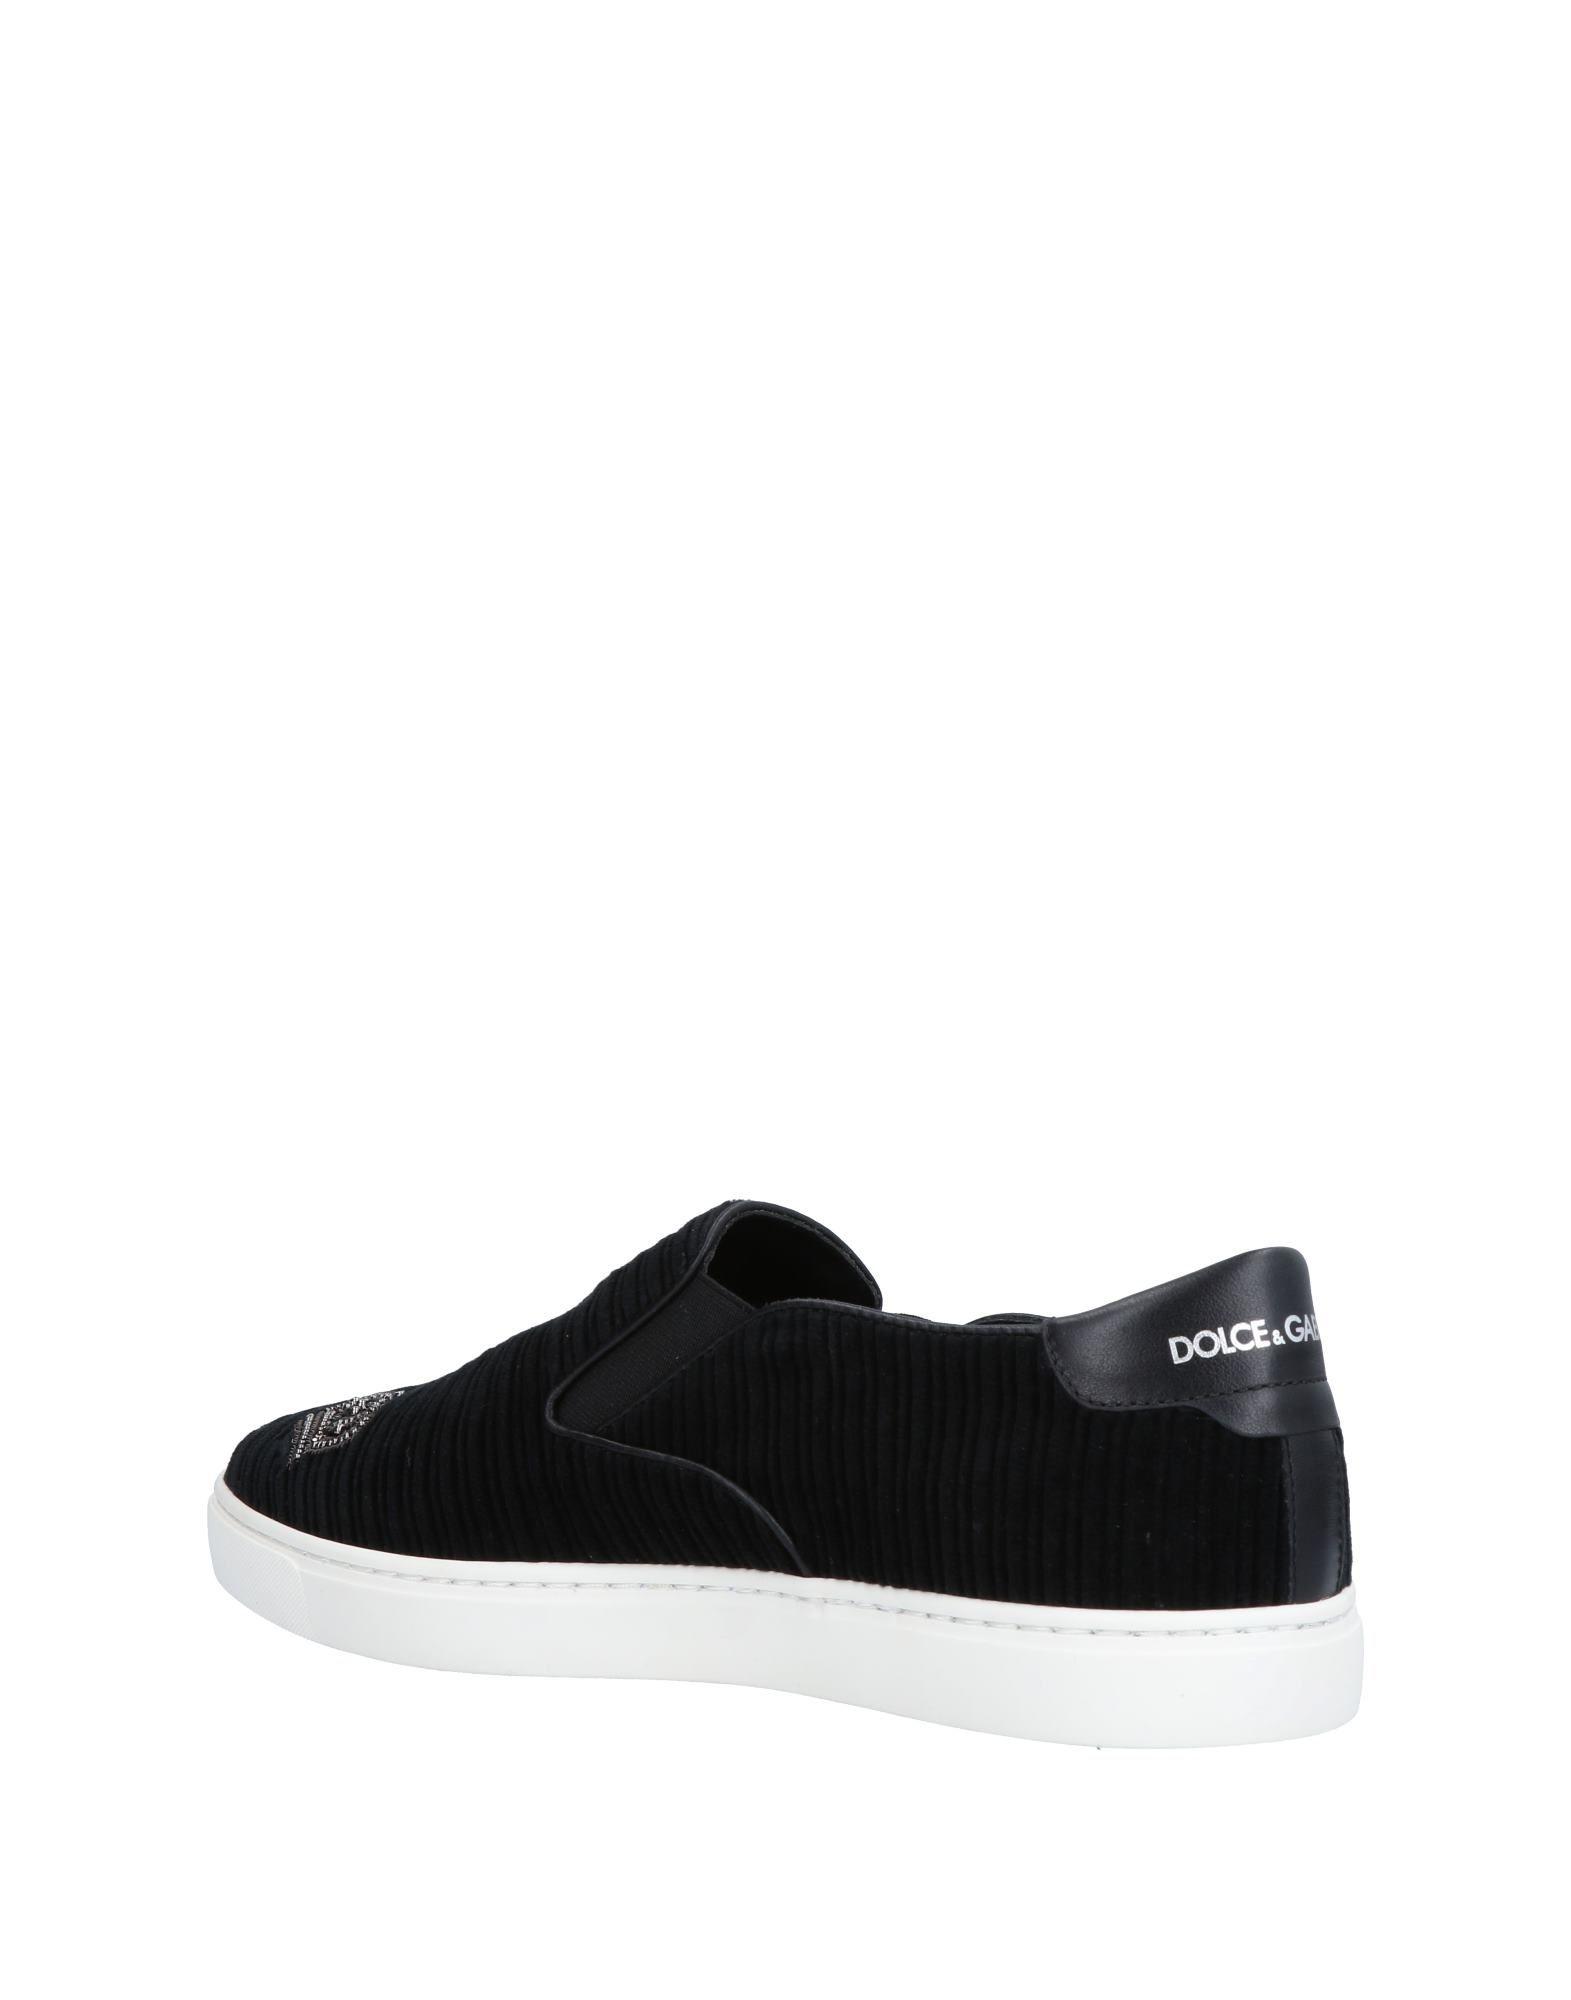 Dolce & Gabbana Sneakers beliebte Herren  11510264KE Gute Qualität beliebte Sneakers Schuhe 4b0bcd